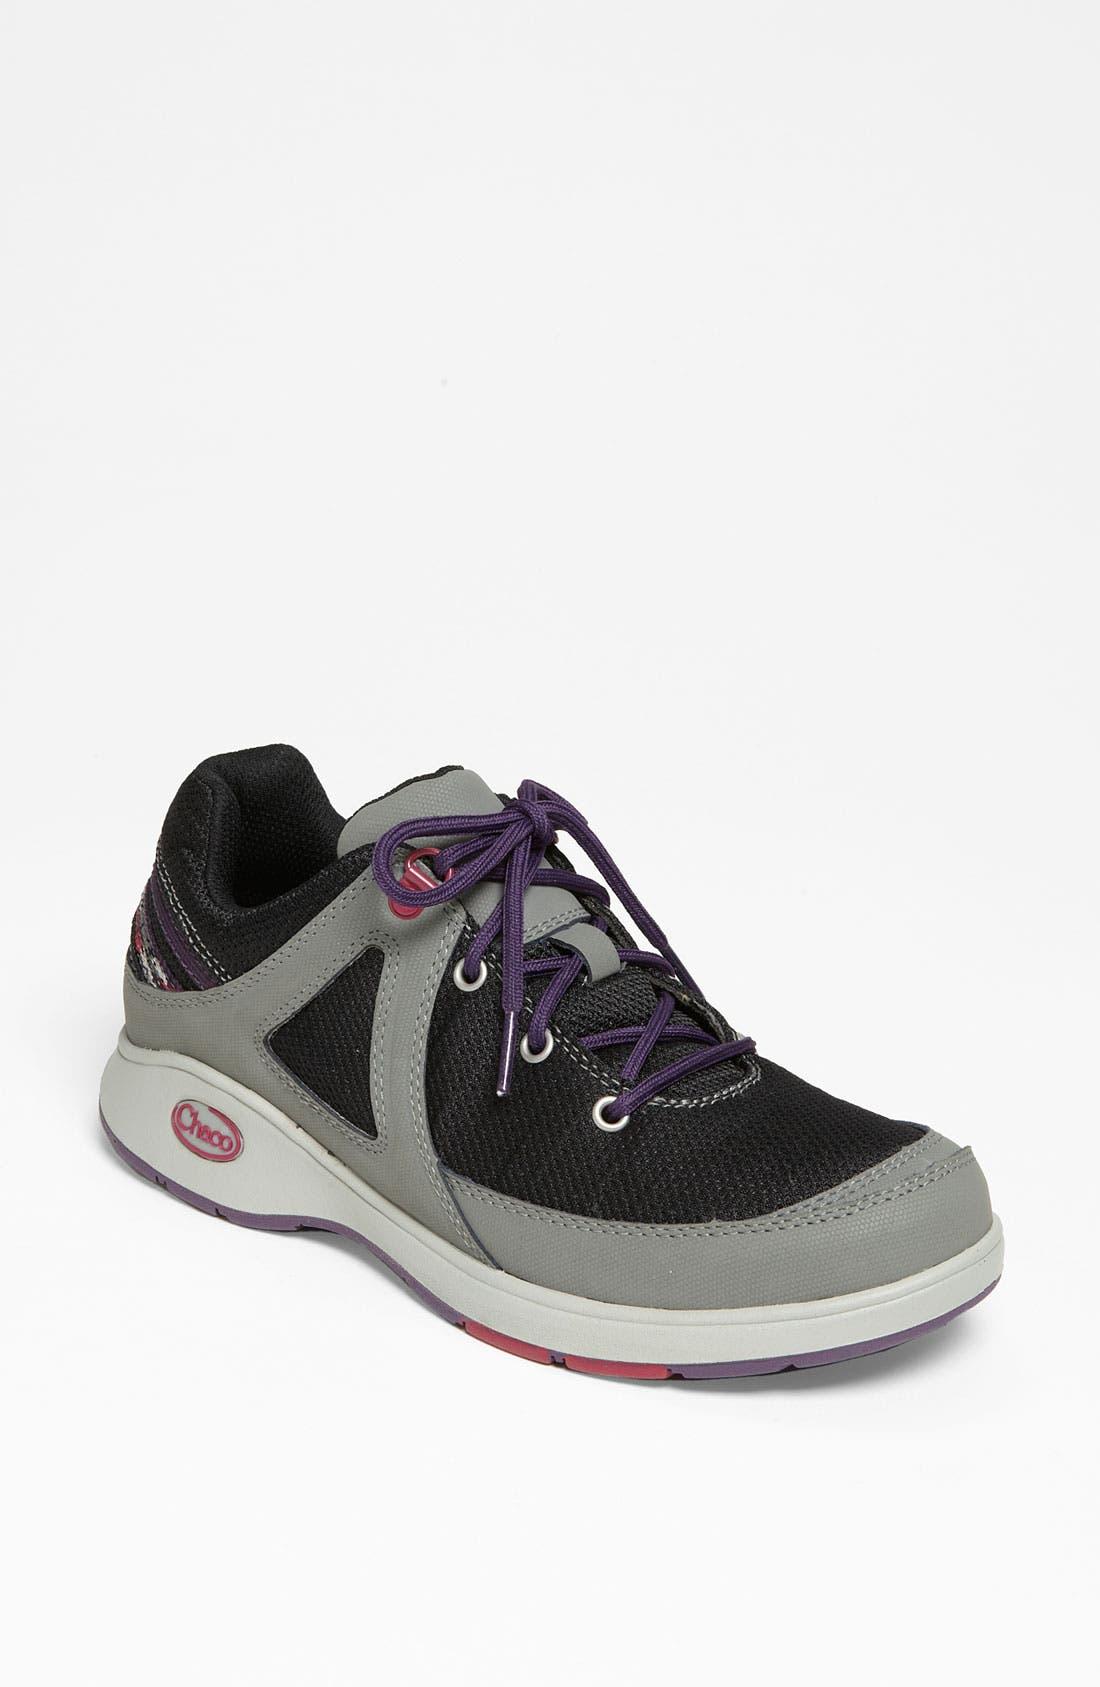 Alternate Image 1 Selected - Chaco 'Vika' Sneaker (Women)